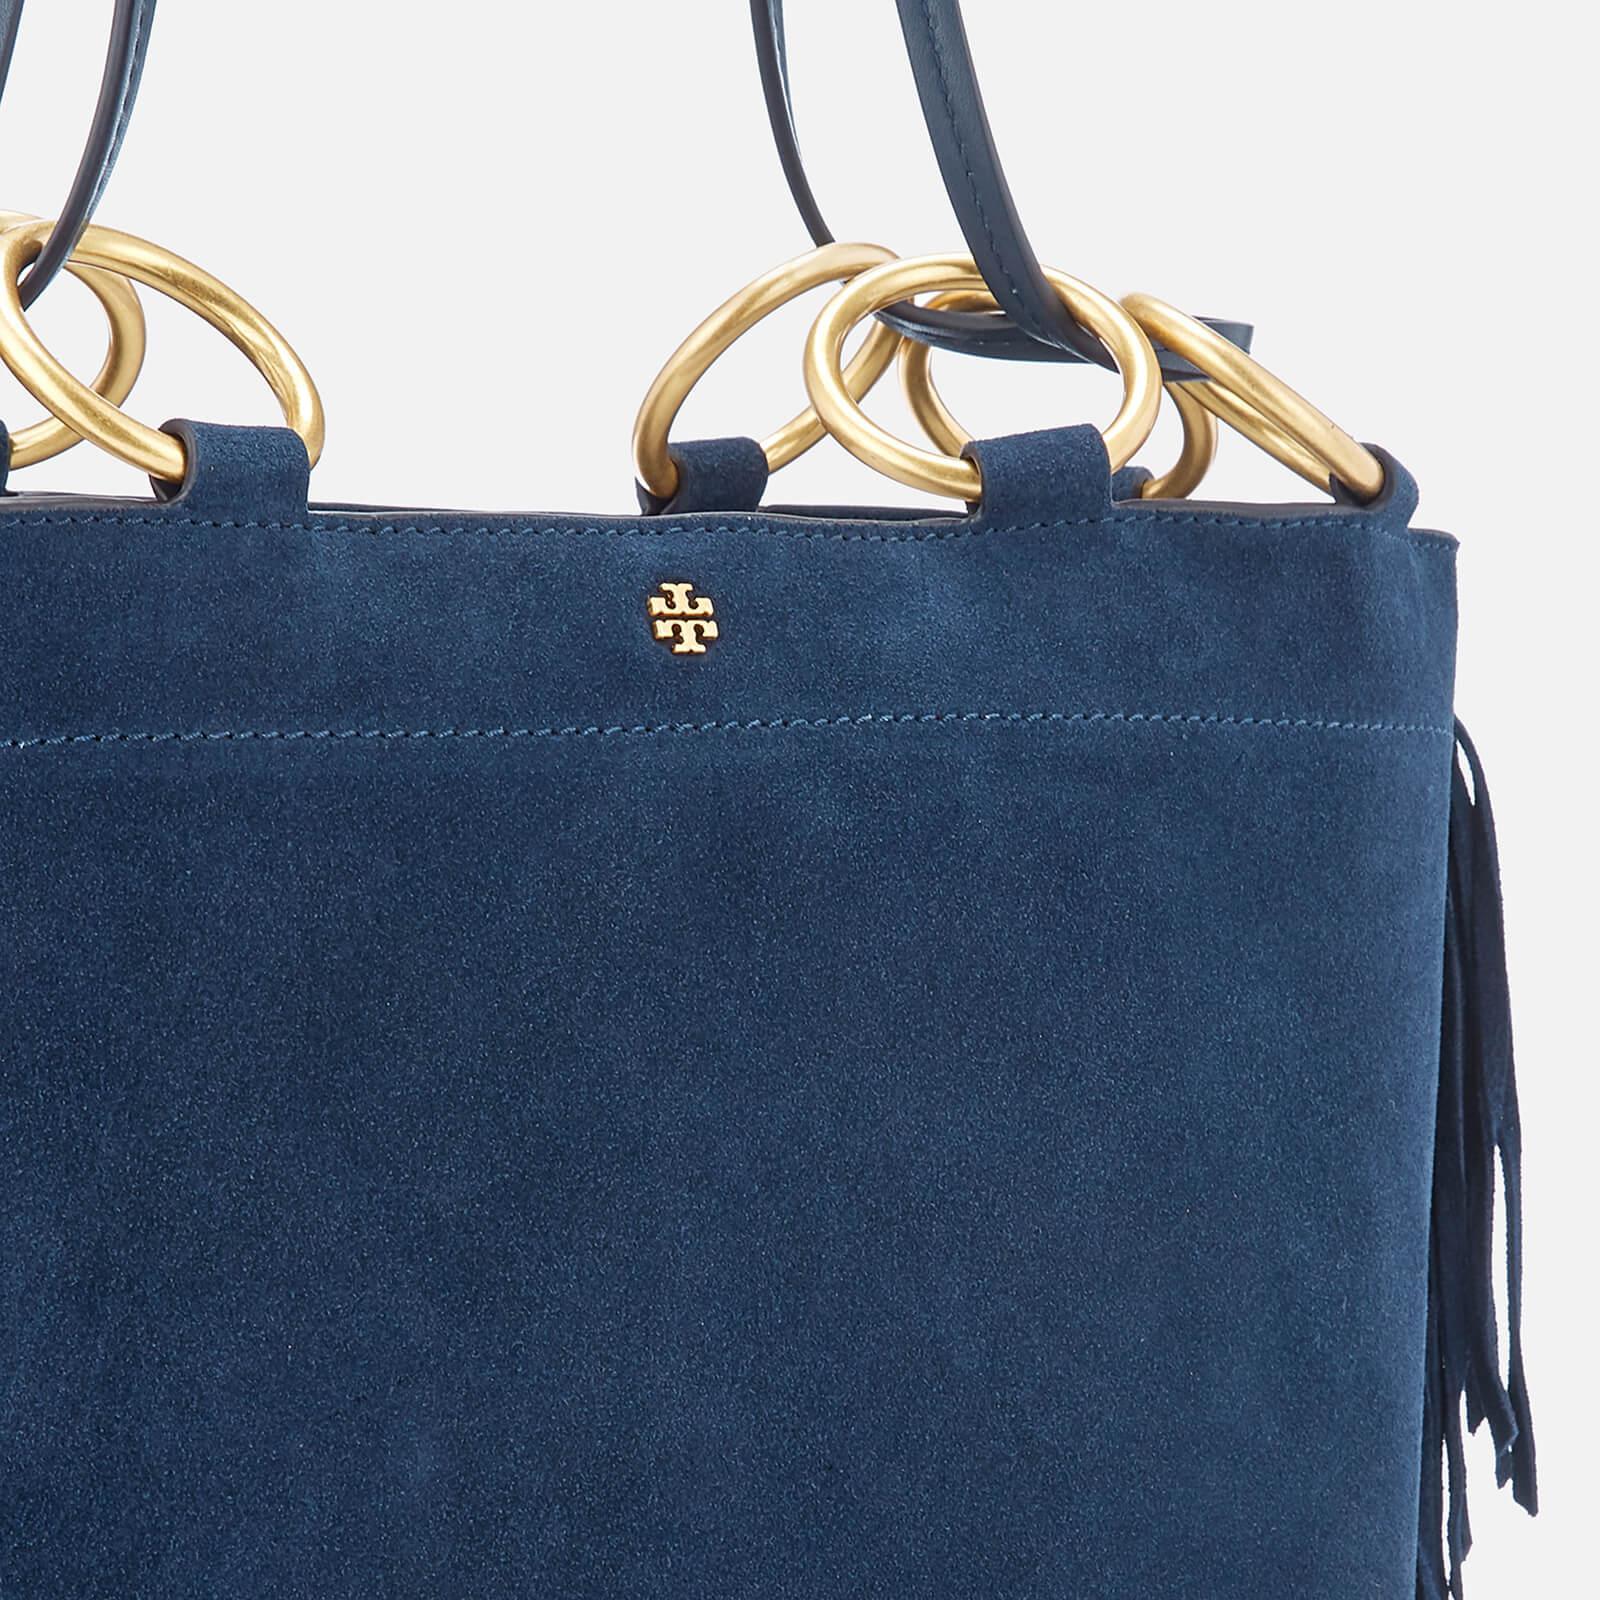 6d7f565139ef Tory Burch - Blue Farrah Fringe Minik Tote Bag - Lyst. View fullscreen